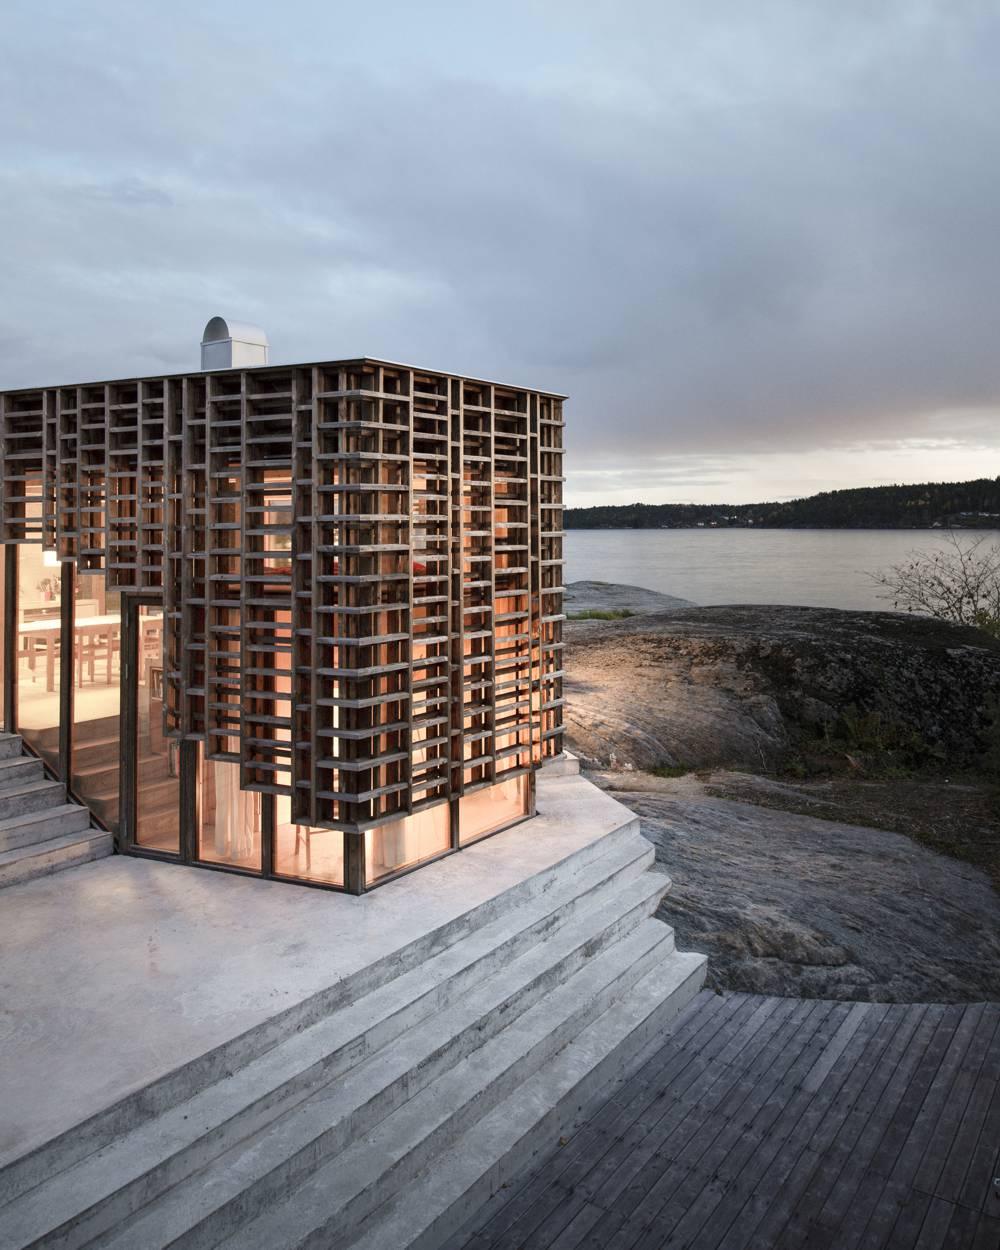 Atelier Oslo - Skåtøy - Photo: Ivar Kvaal